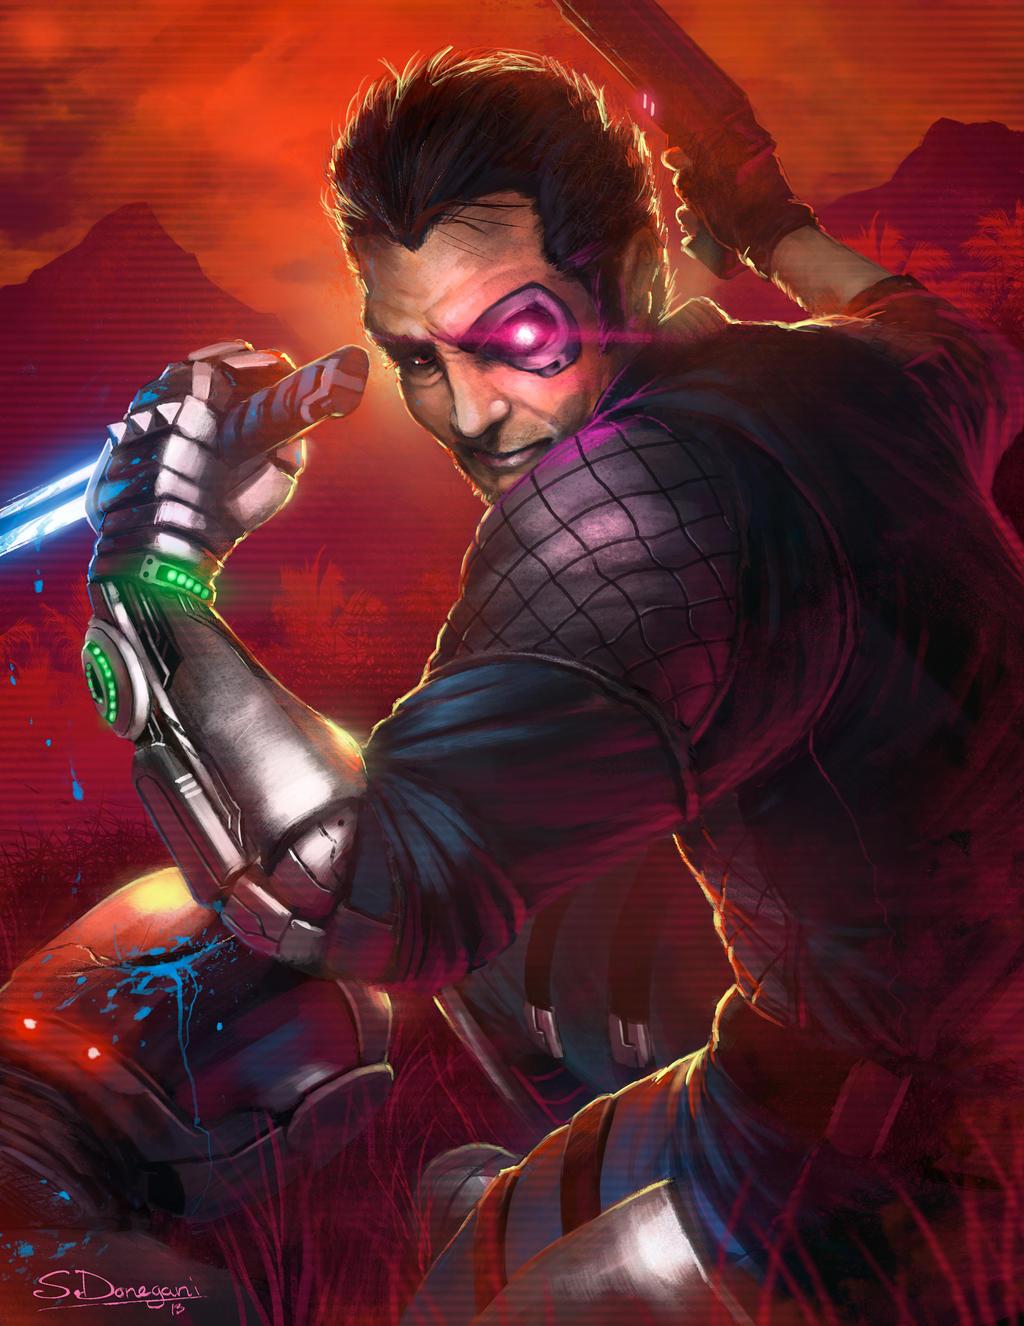 Far Cry 3 Blood Dragon Rex Power Colt By Steven Donegani On